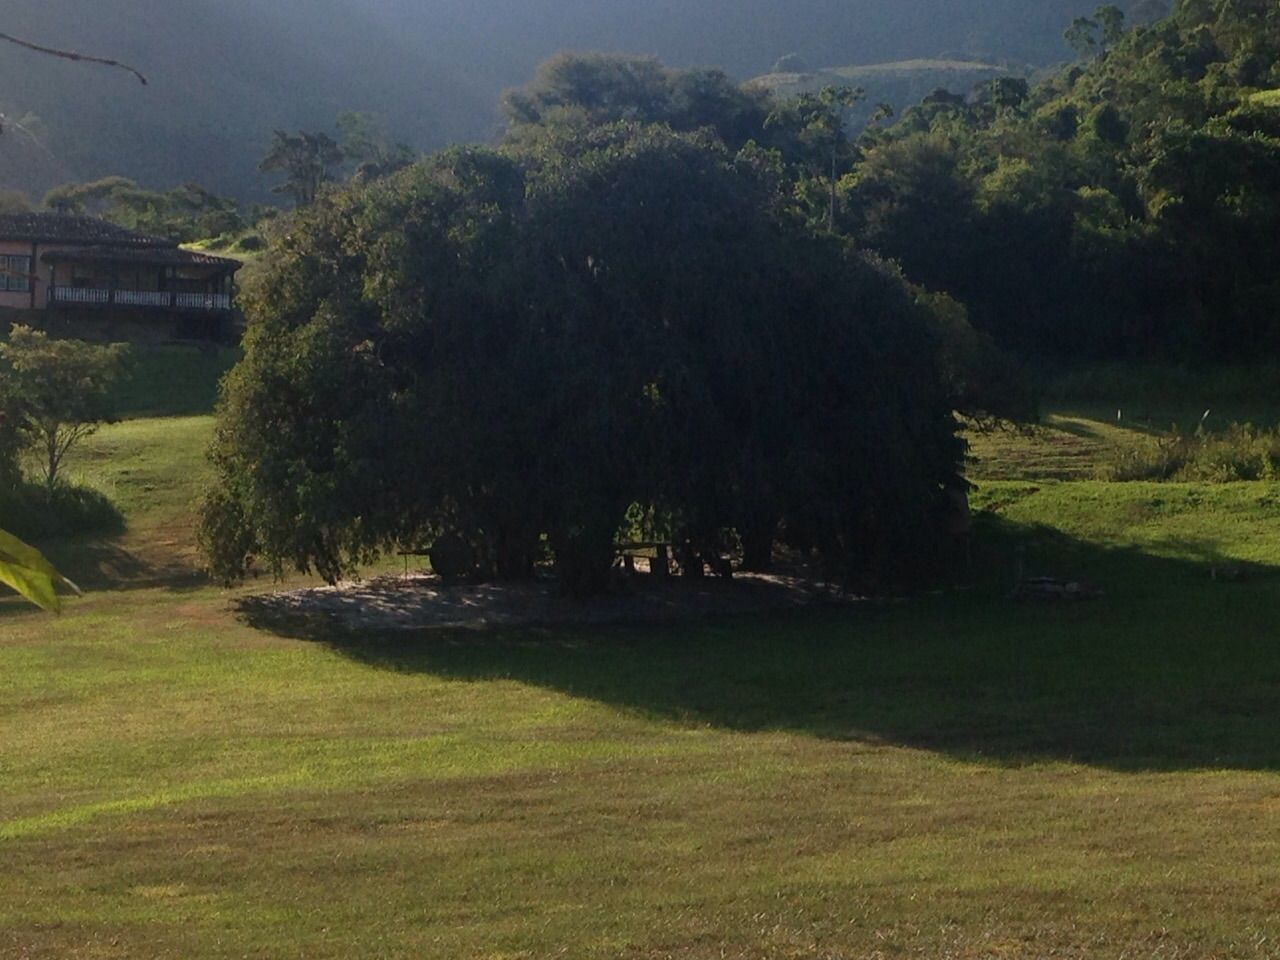 Reservado Ibitipoca- Jabuticabeira